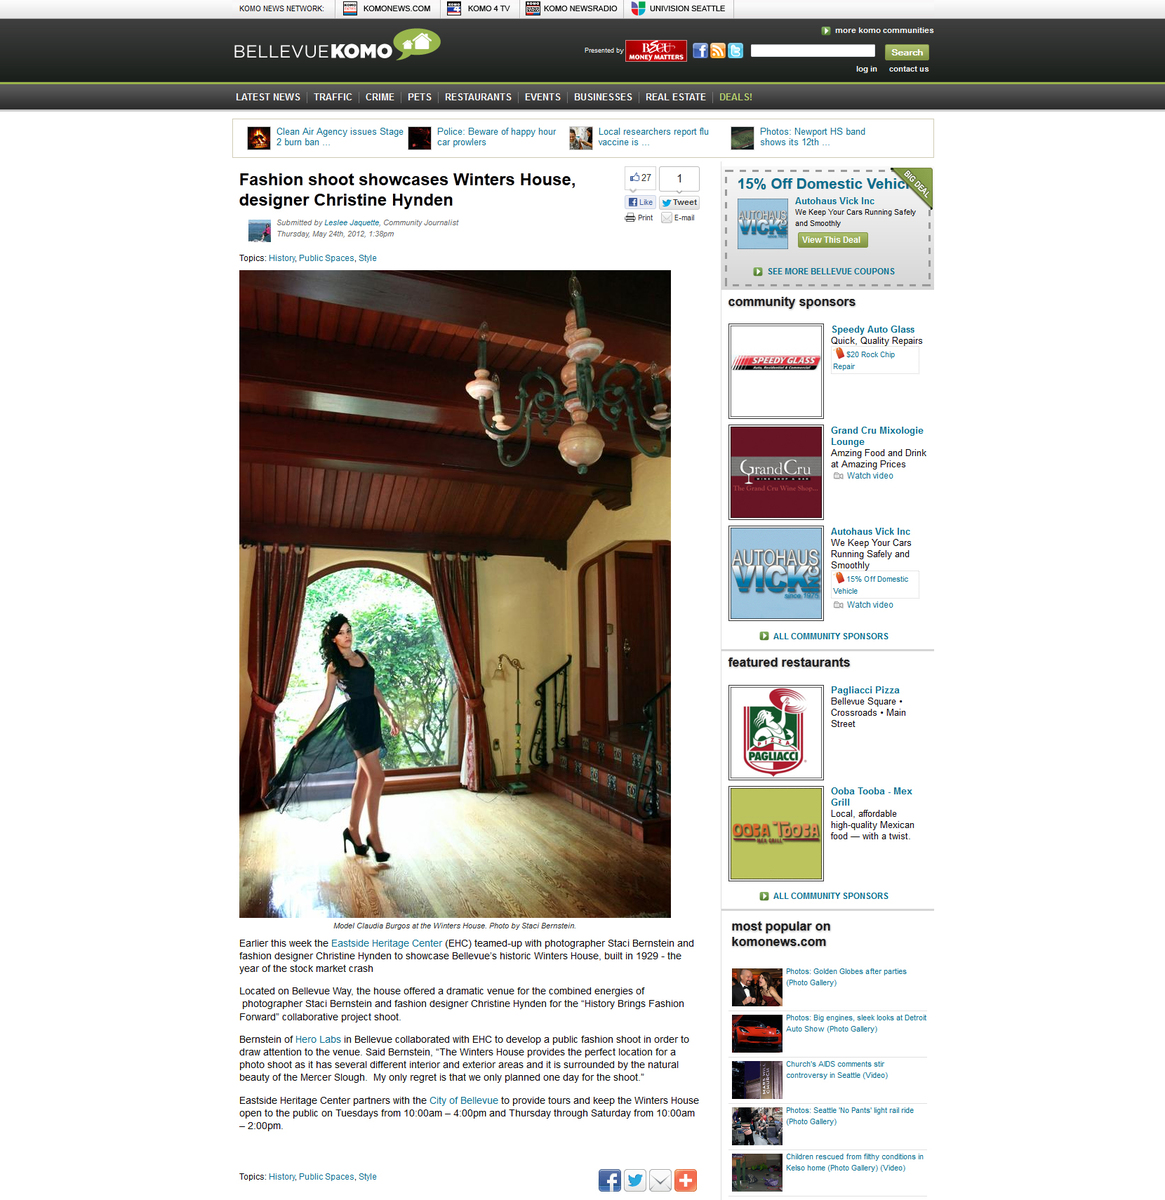 http://bellevue.komonews.com/news/history/751856-fashion-shoot-showcases-winters-house-designer-christine-hynden